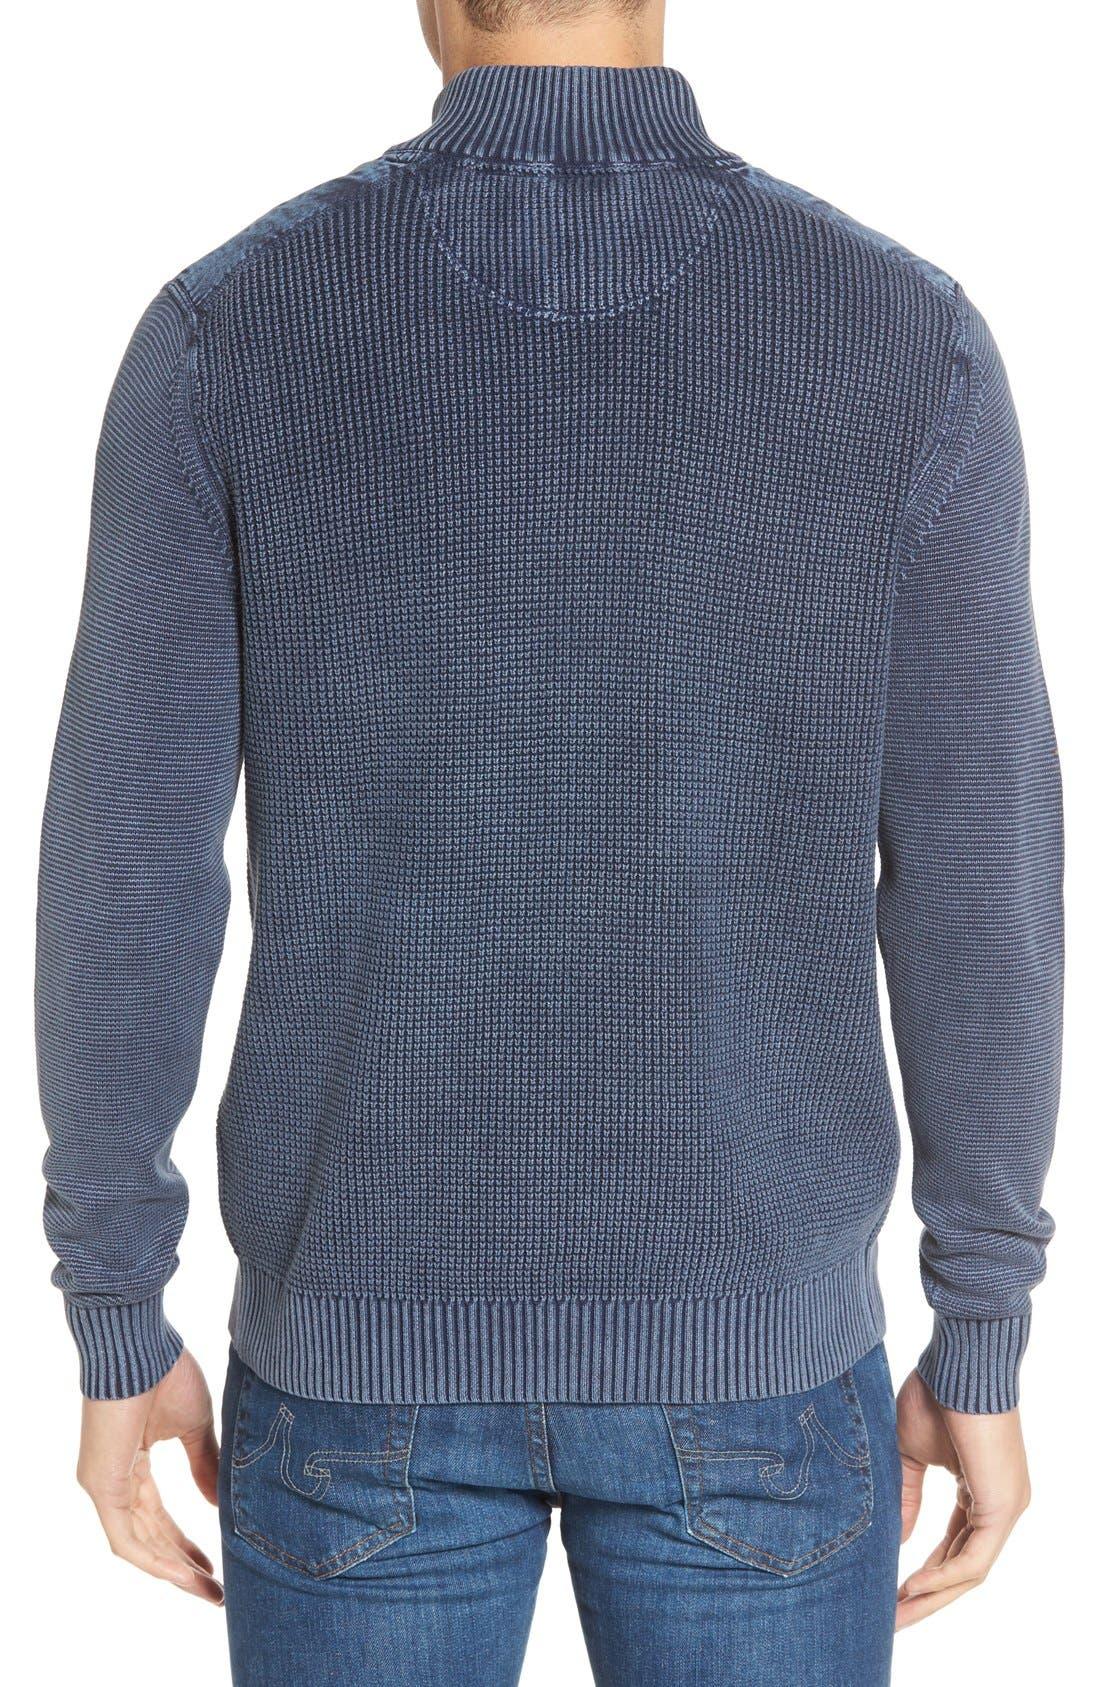 Coastal Shores Quarter Zip Sweater,                             Alternate thumbnail 17, color,